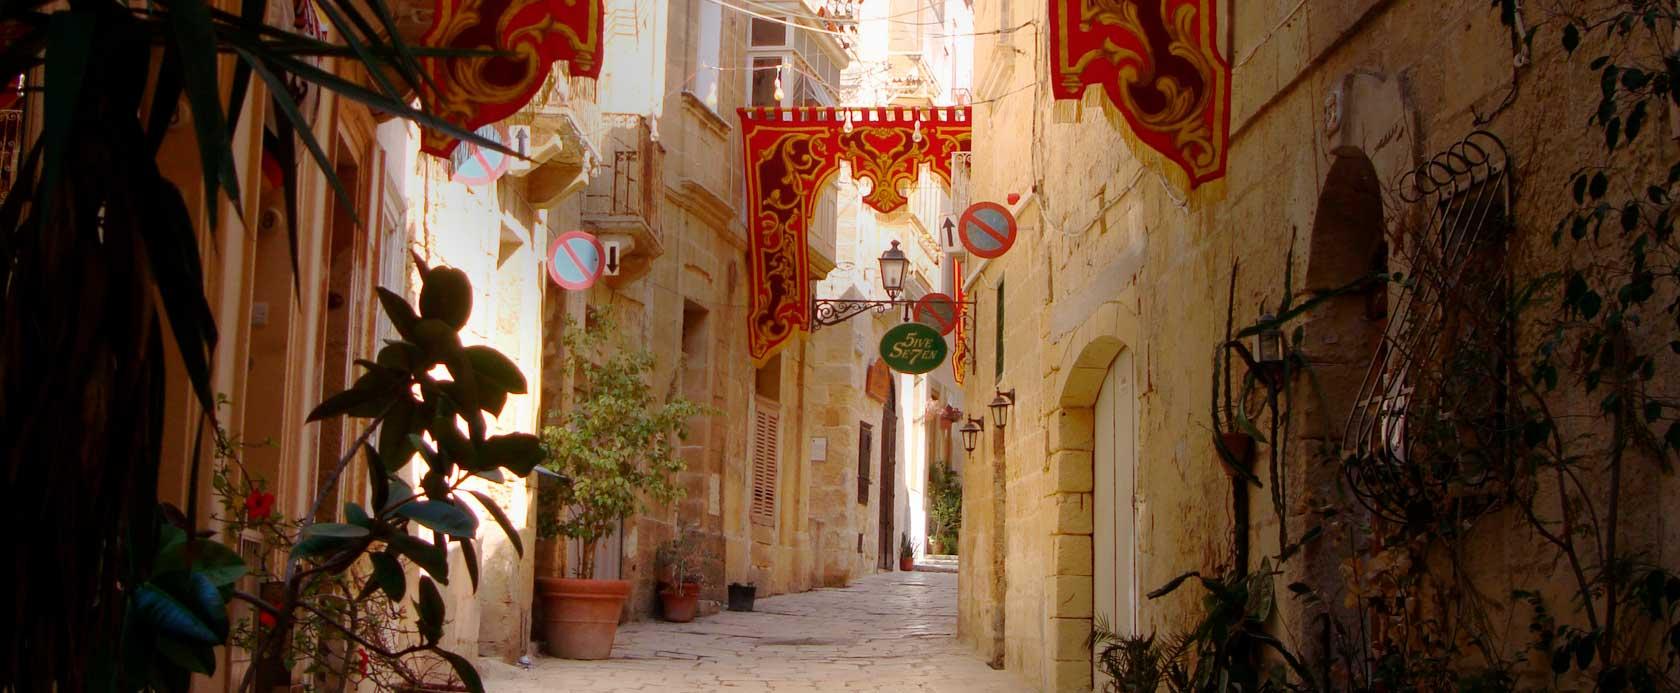 Viajar sola a Malta